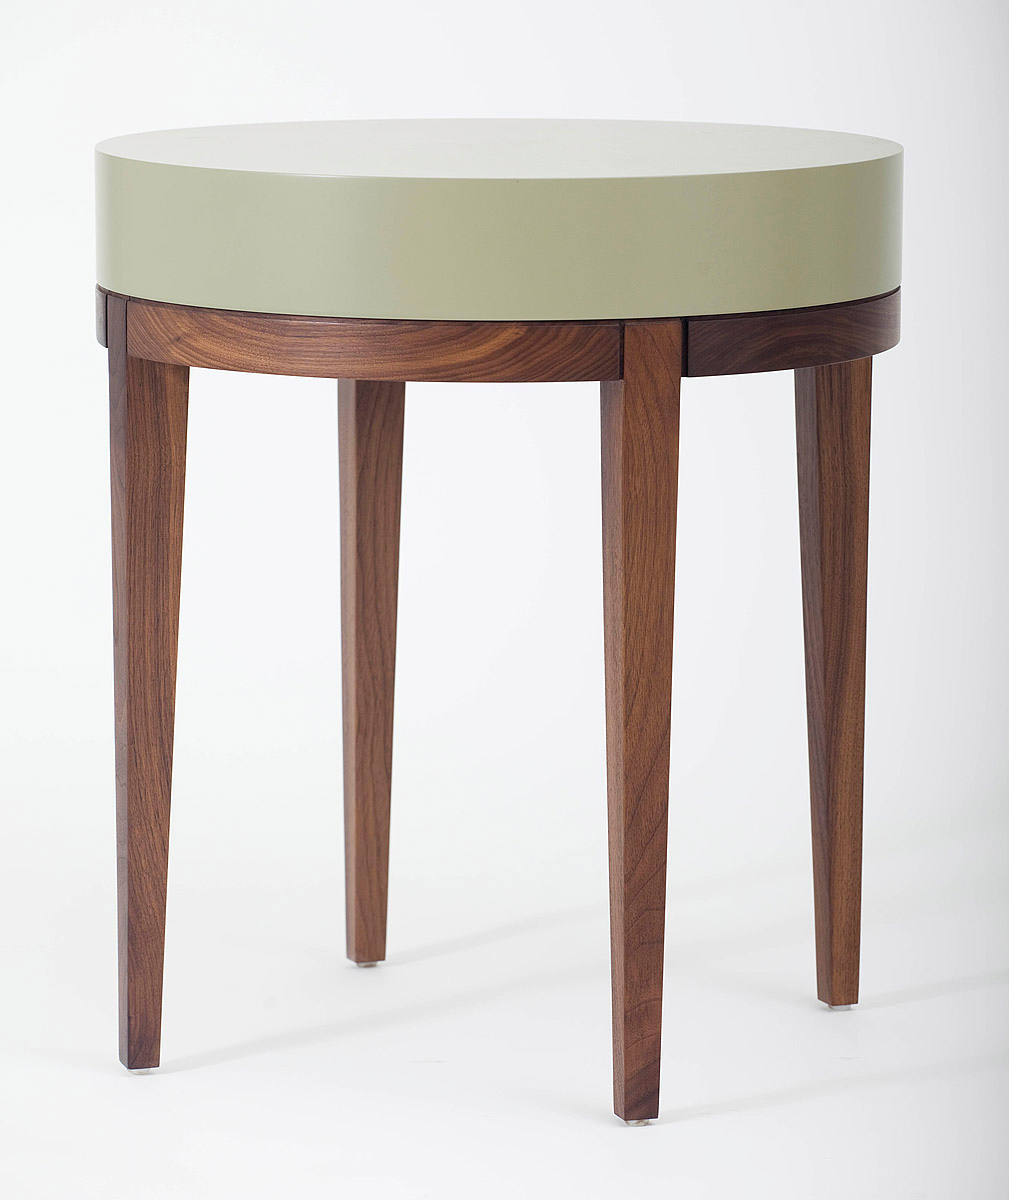 Green 6th side table.jpg